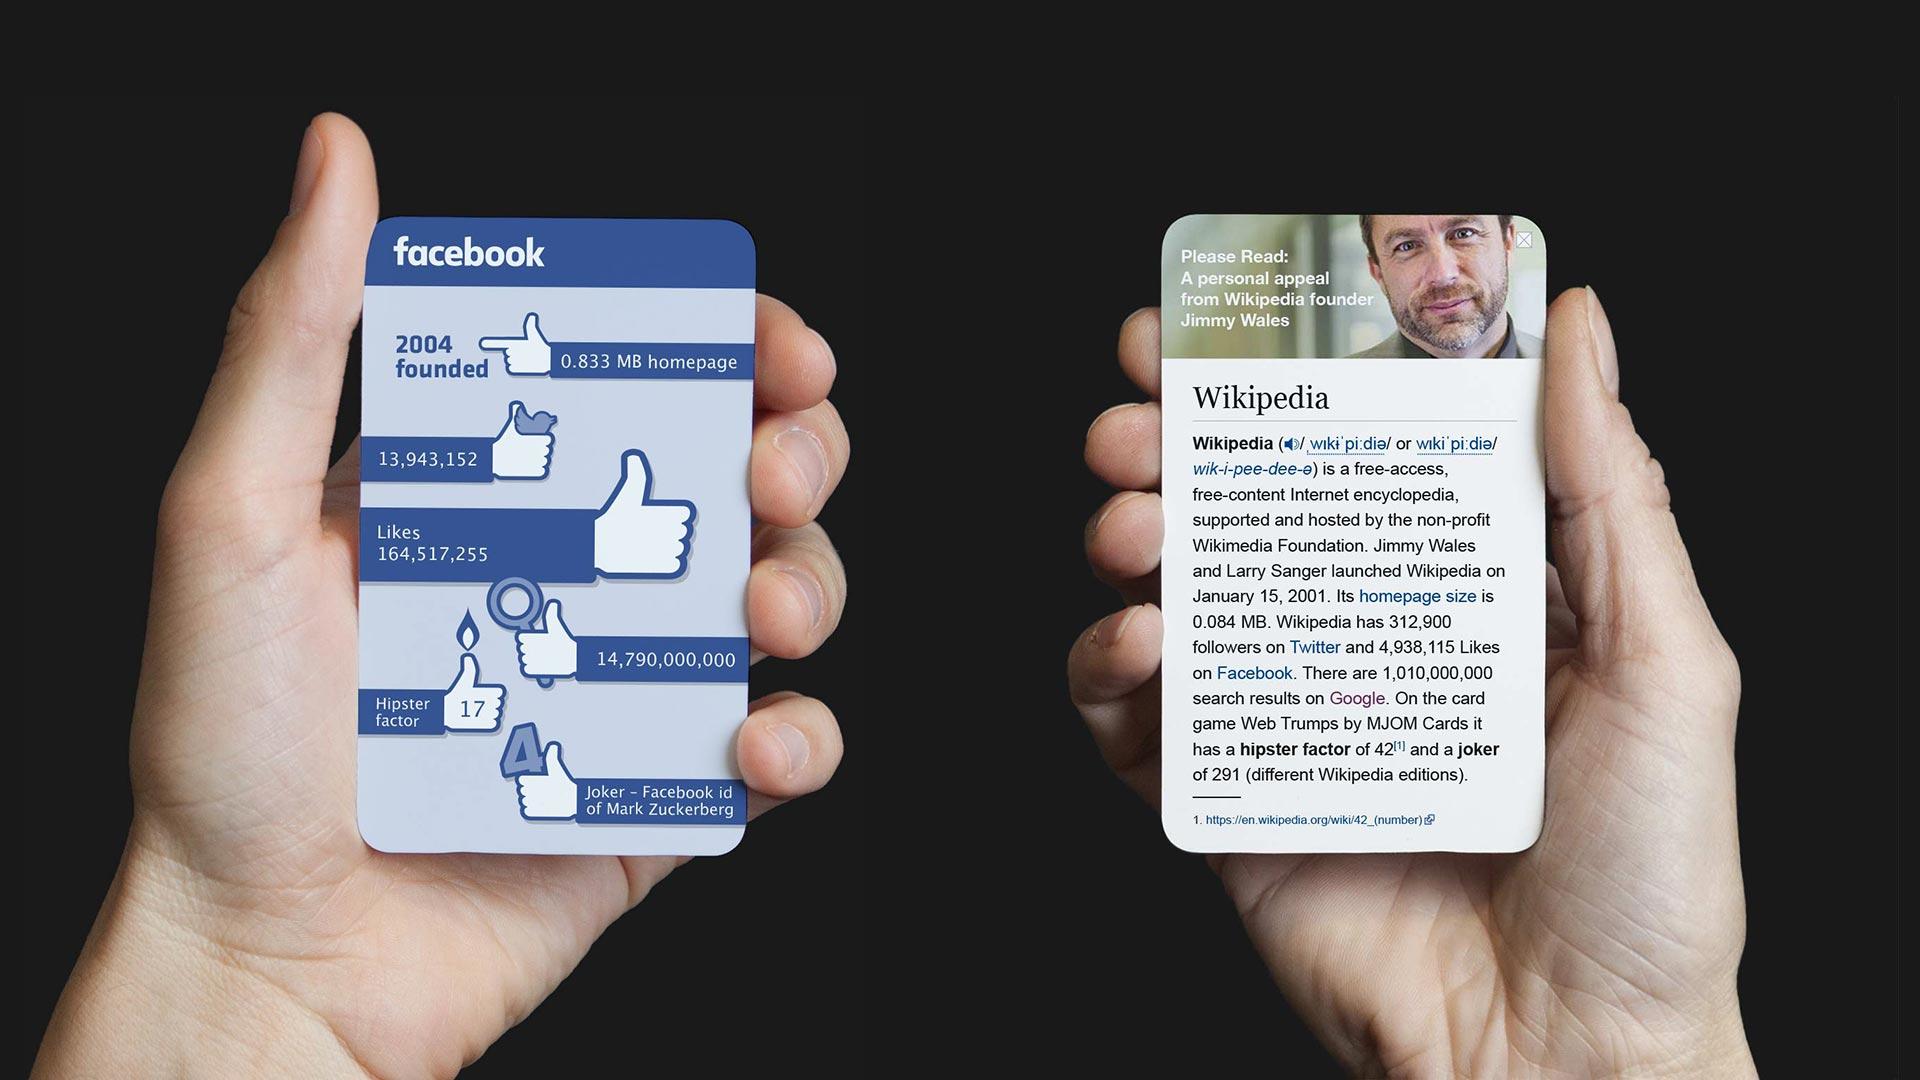 MJOM Cards Web Trumps – Facebook vs. Wikipedia